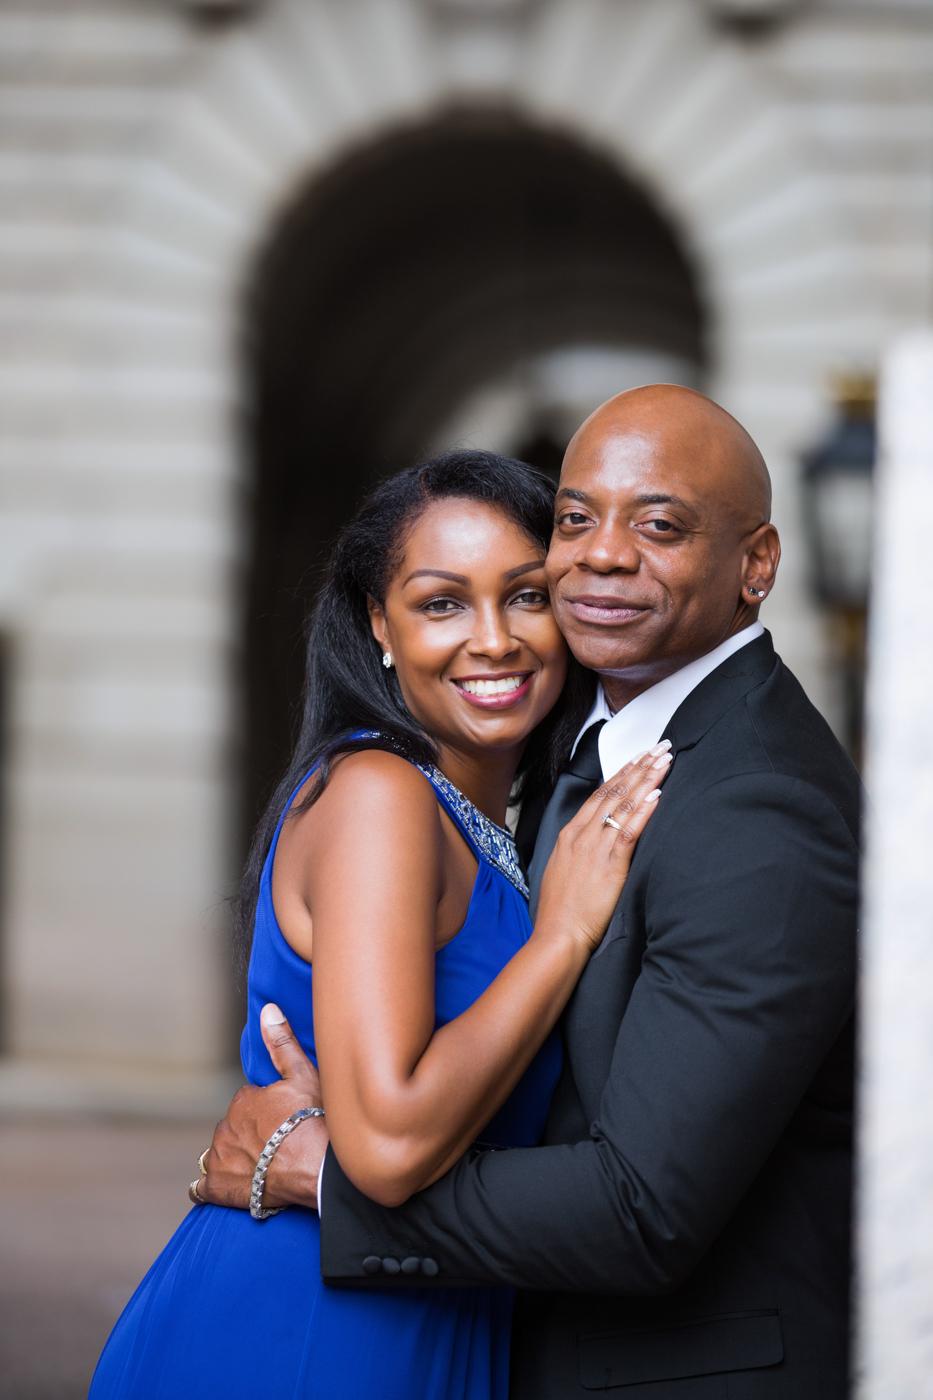 wedding-anniversary-photo-shoot-in-washington-dc-ksenia-pro-photography-25